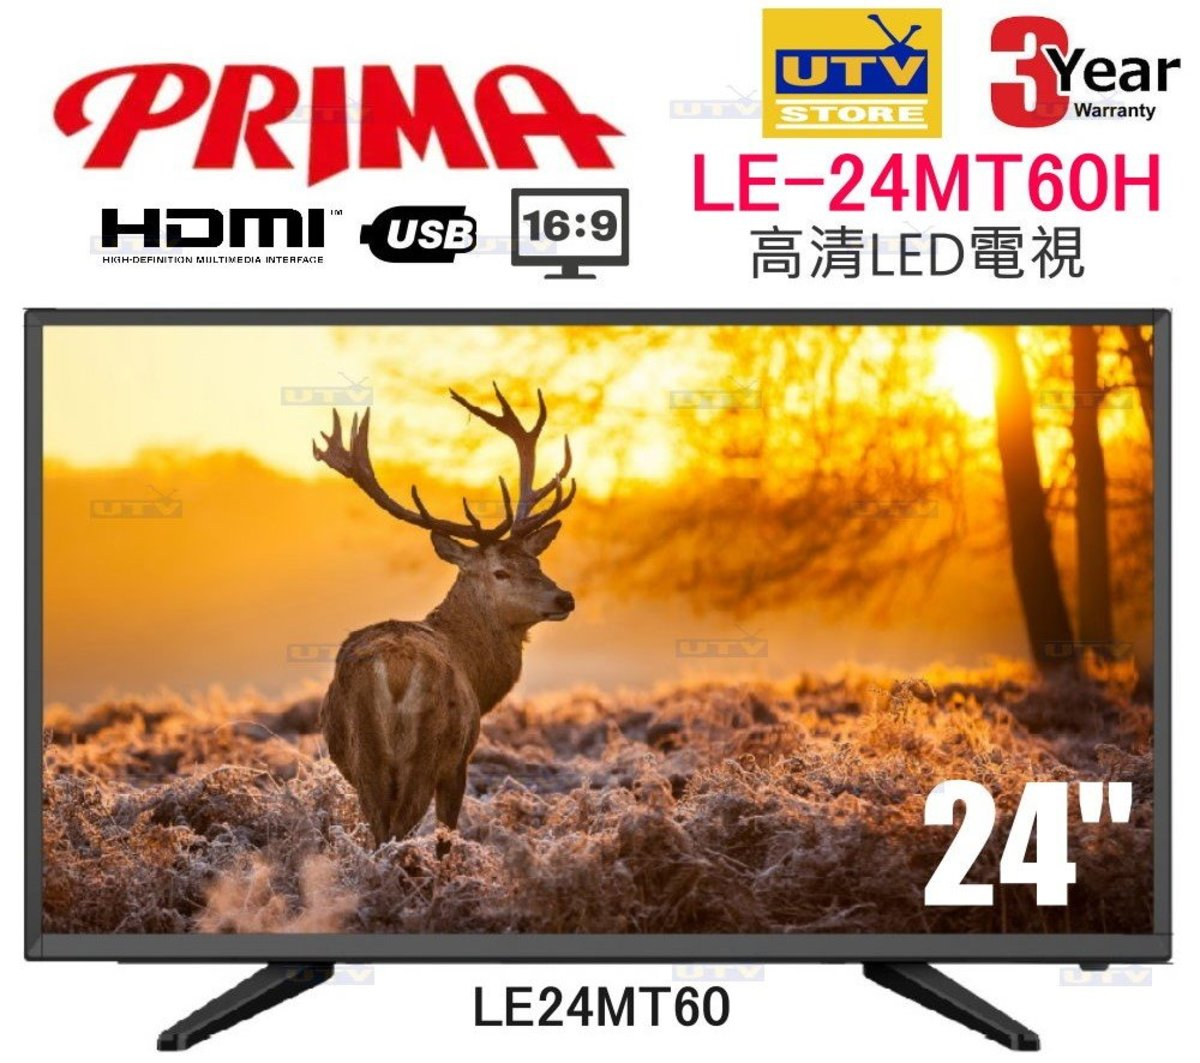 LE-24MT60 24 1080P TV 全高清電視